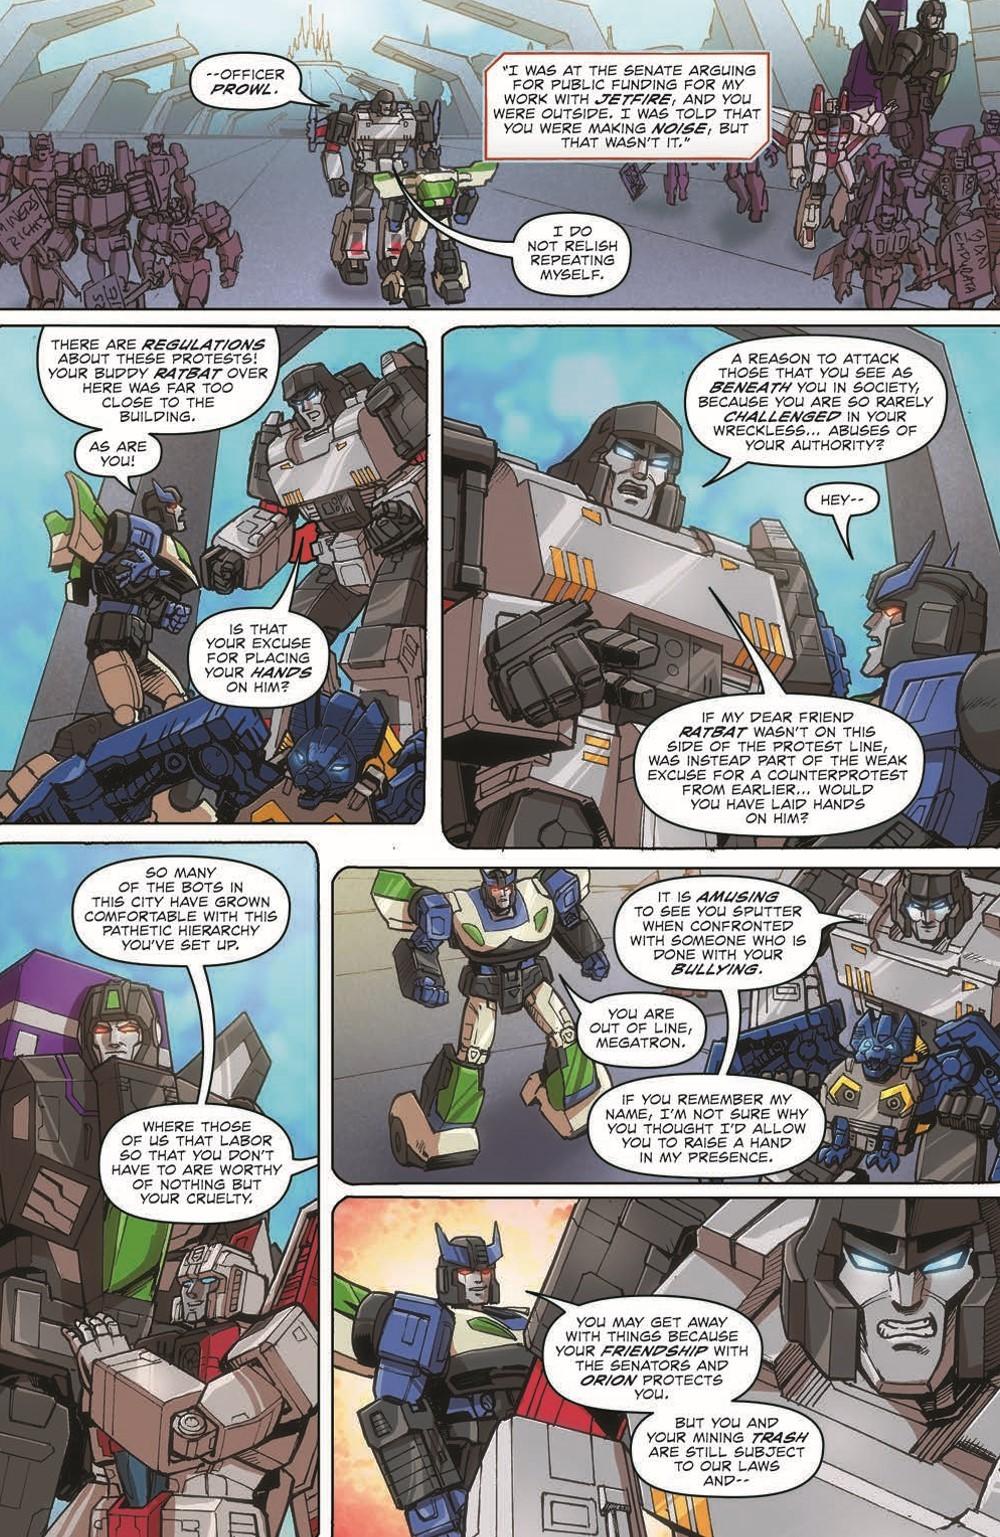 TF_ShatGlass02-pr-7 ComicList Previews: TRANSFORMERS SHATTERED GLASS #2 (OF 5)